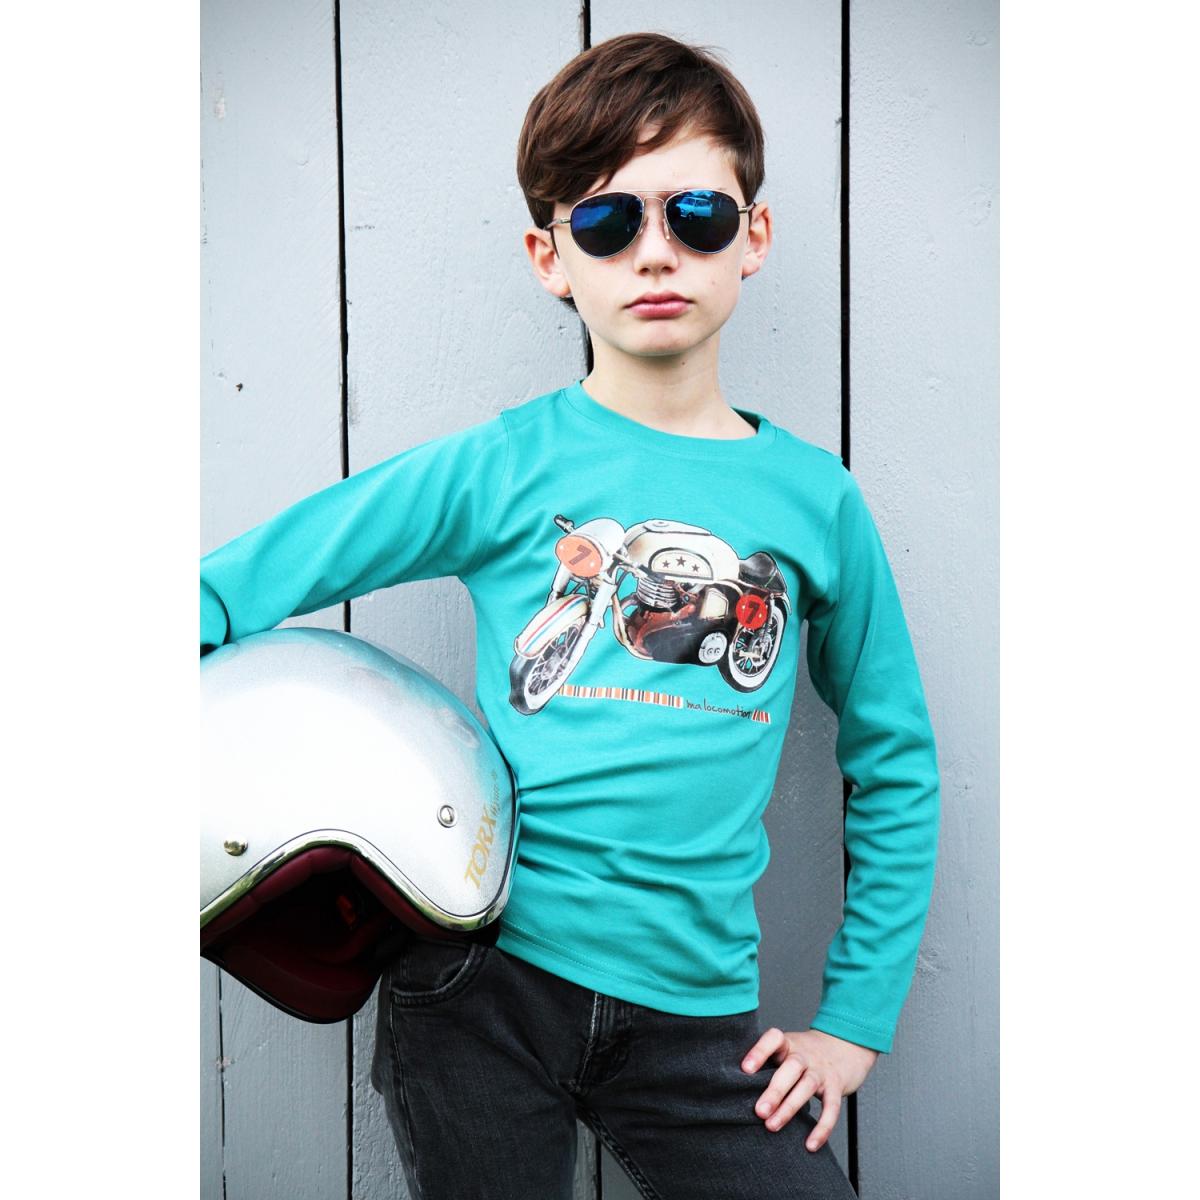 Vintage mototrcycle t-shirt - bleu green